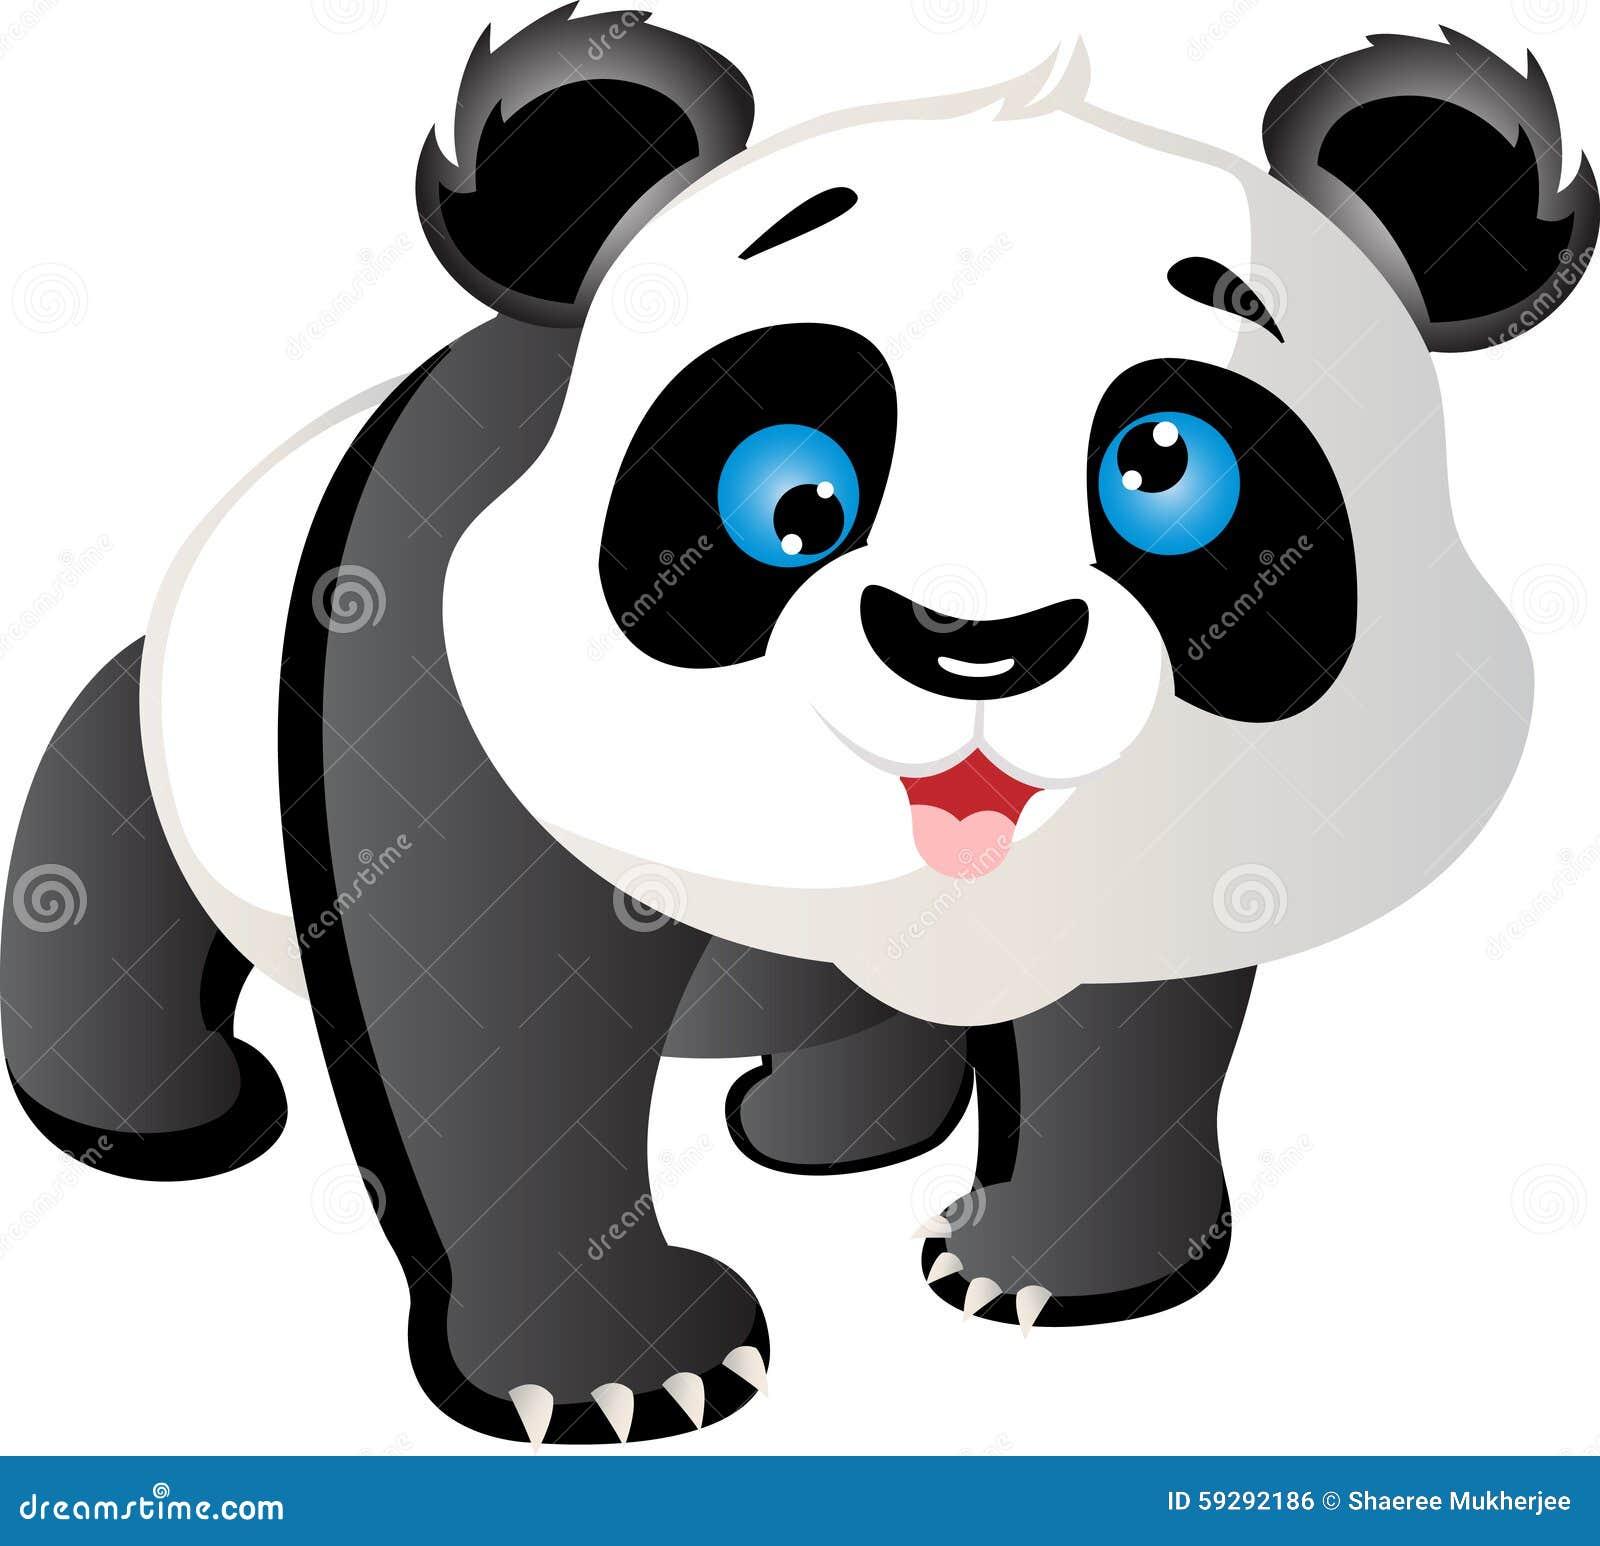 Cartoon Monkey Images Stock Photos amp Vectors  Shutterstock